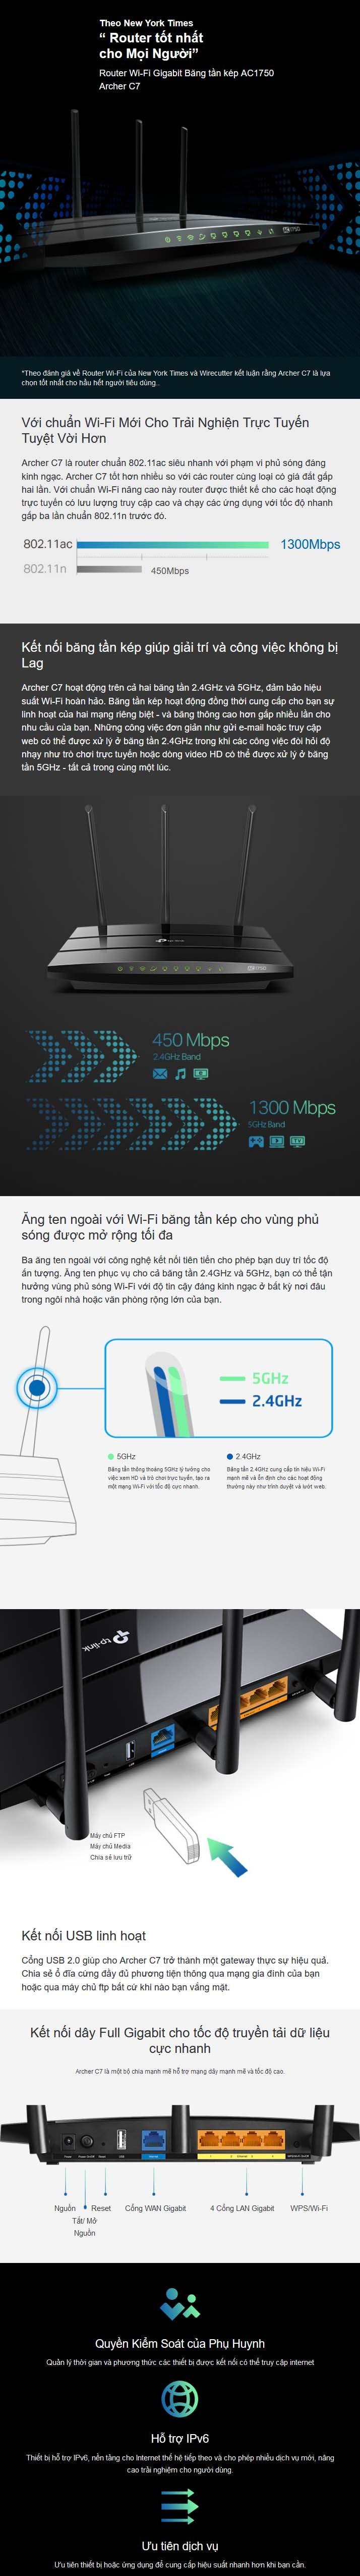 Bộ phát WIFI Router TP-Link Archer C7 Băng Tần Kép AC1750